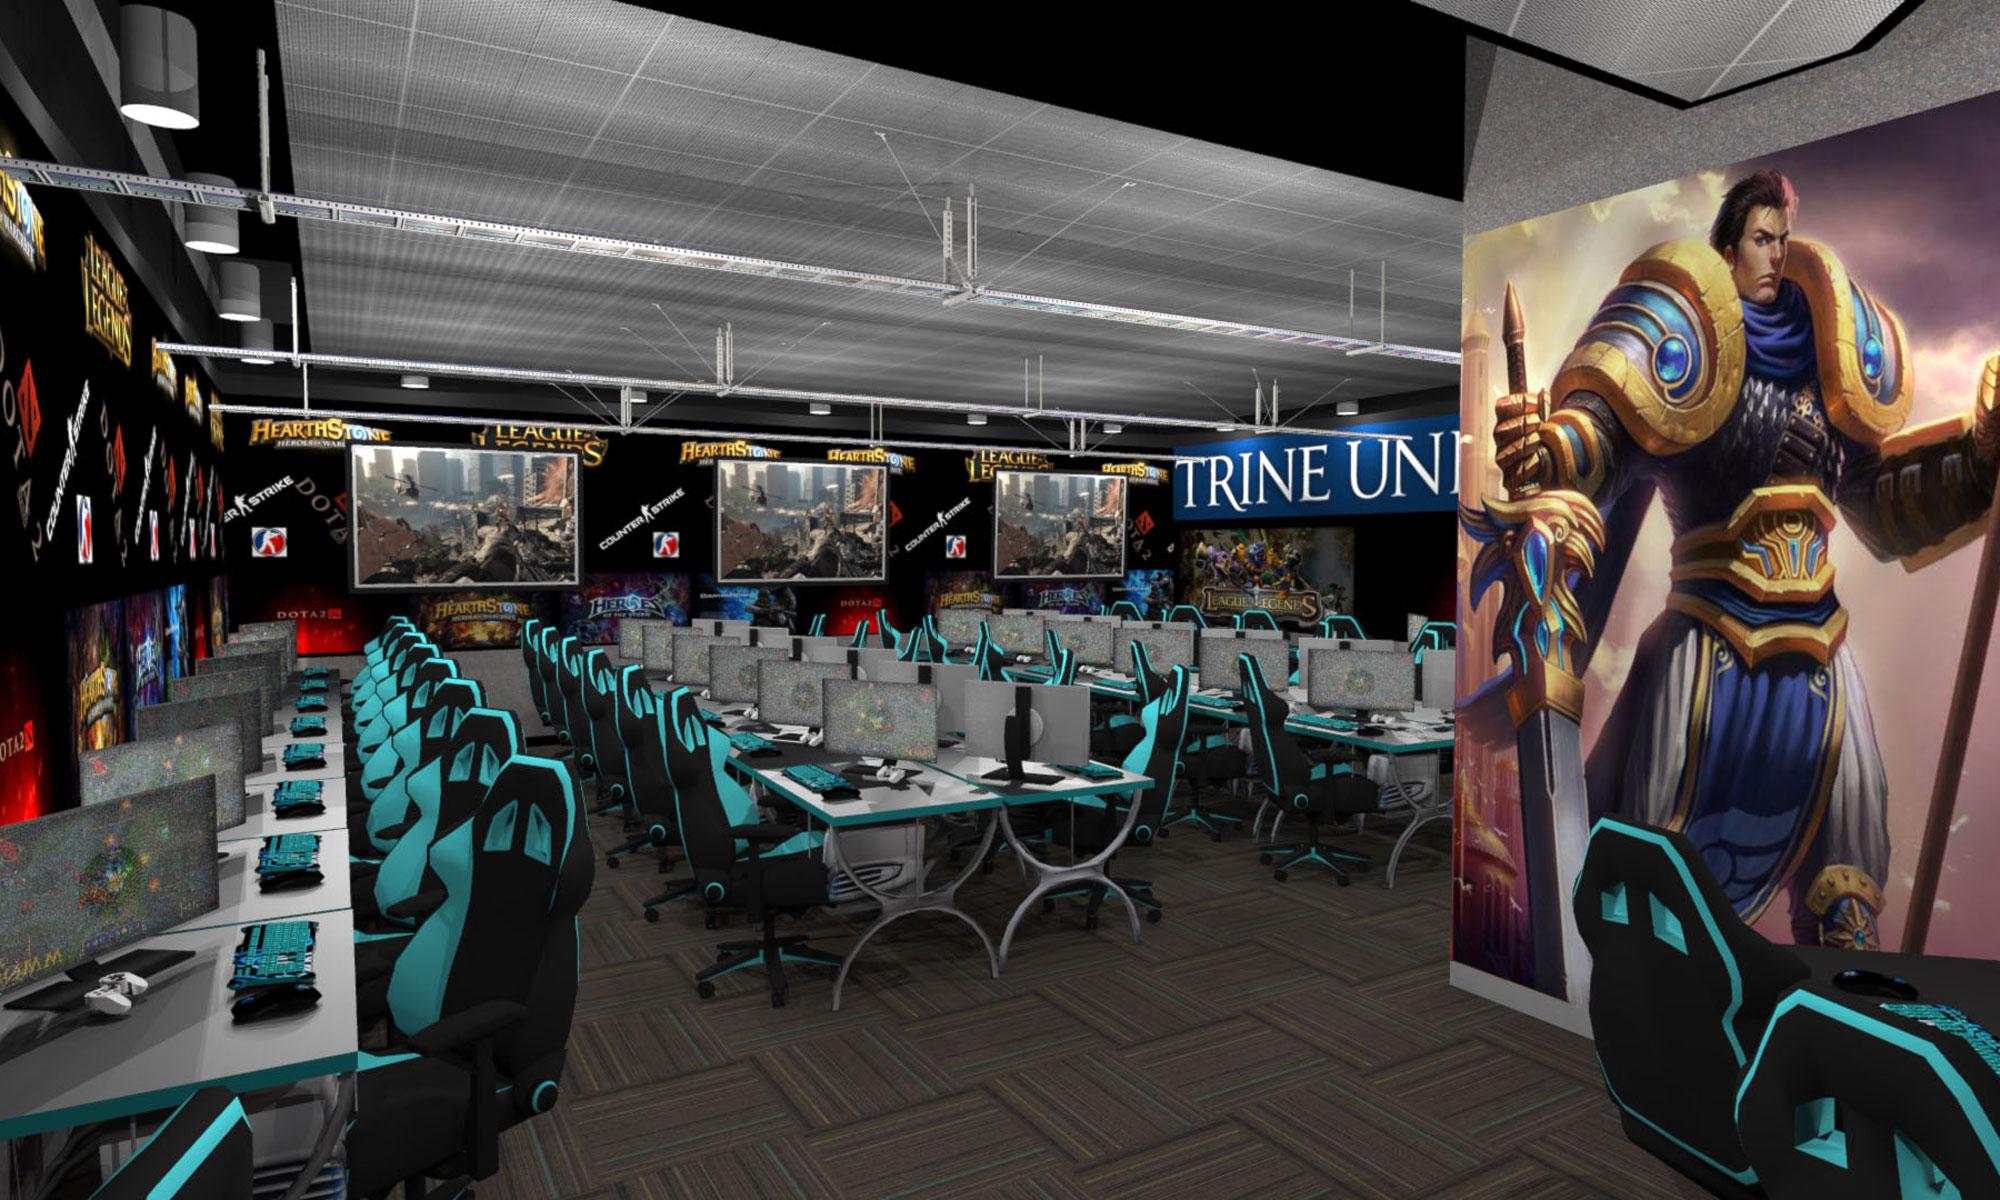 Trine University Interior